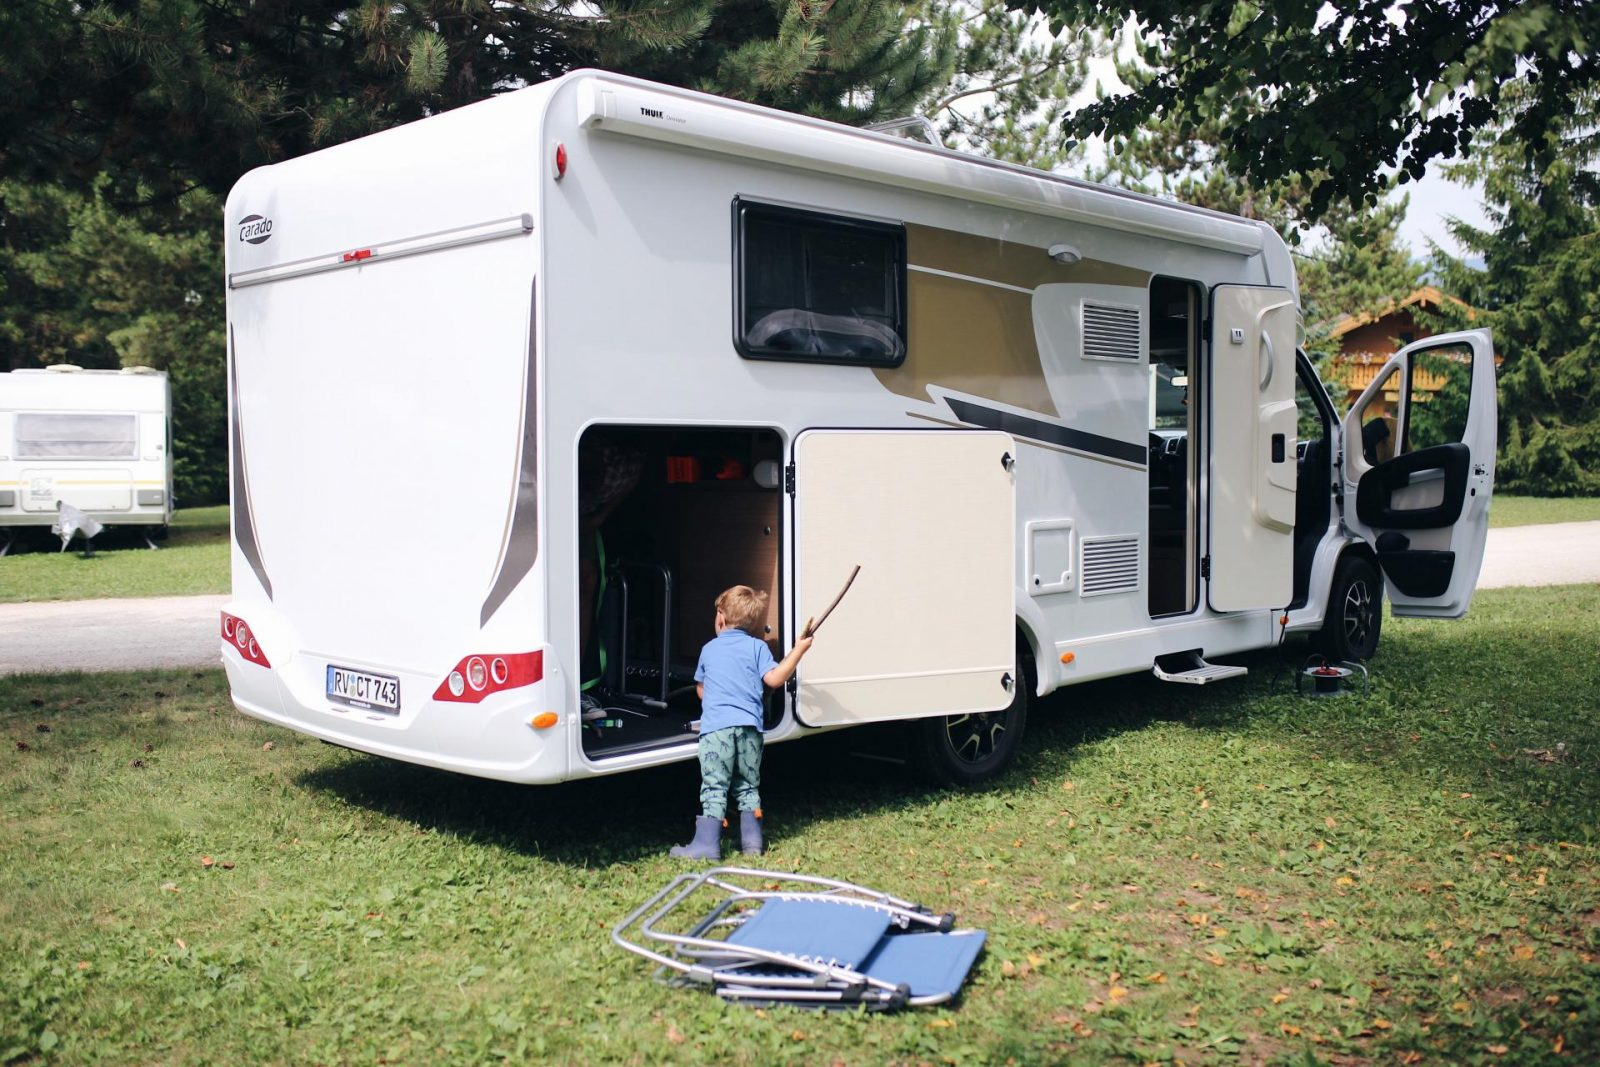 Caravan Roadtrip Pinspiration_Woche1_DC9ED33D-CC0F-4197-93CC-A87D83EB7D94